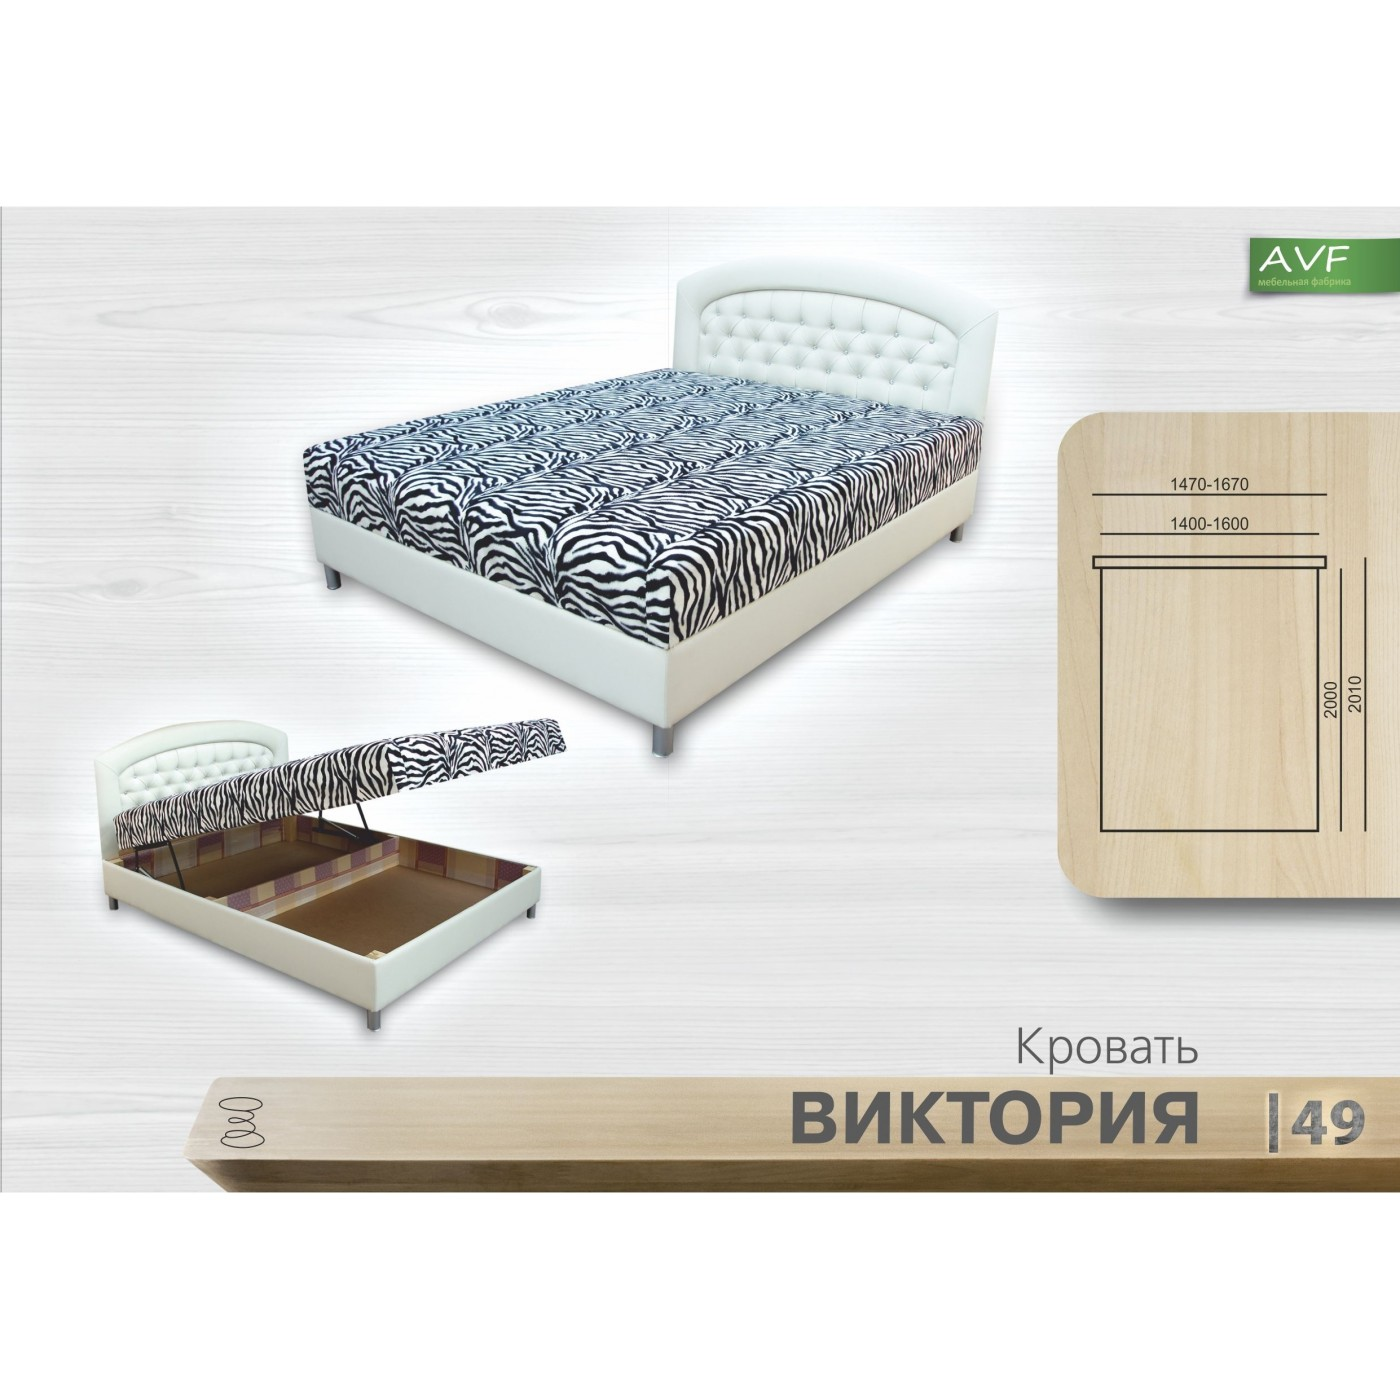 Кровать Виктория (1.4 , пр. бл. зевс, флай)